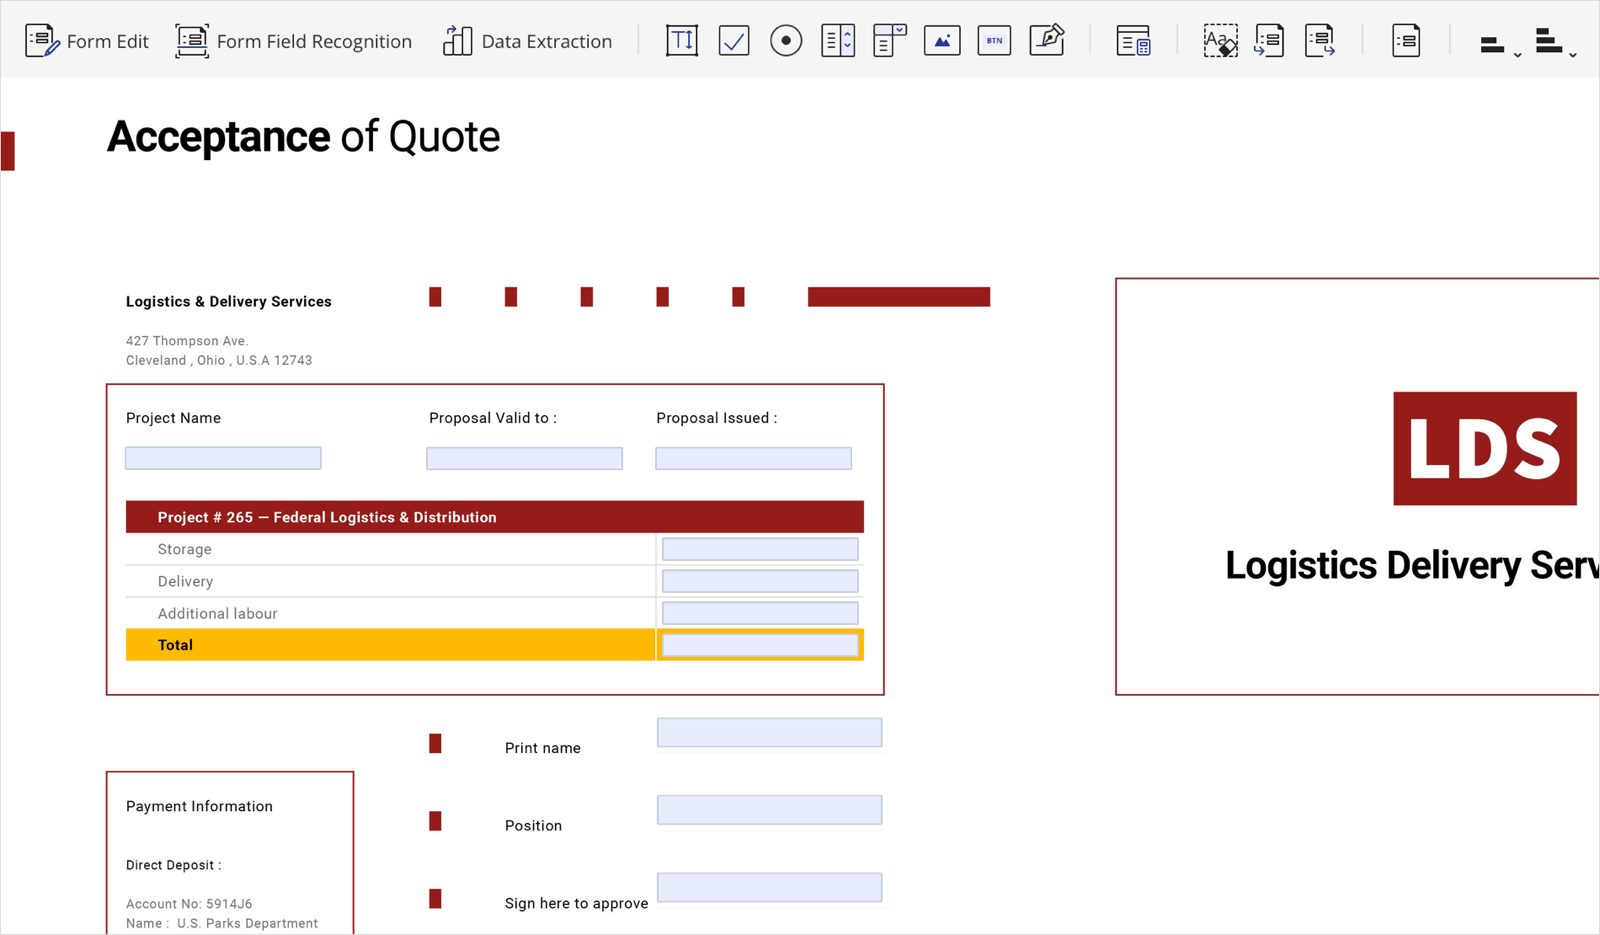 PDFelement form editing